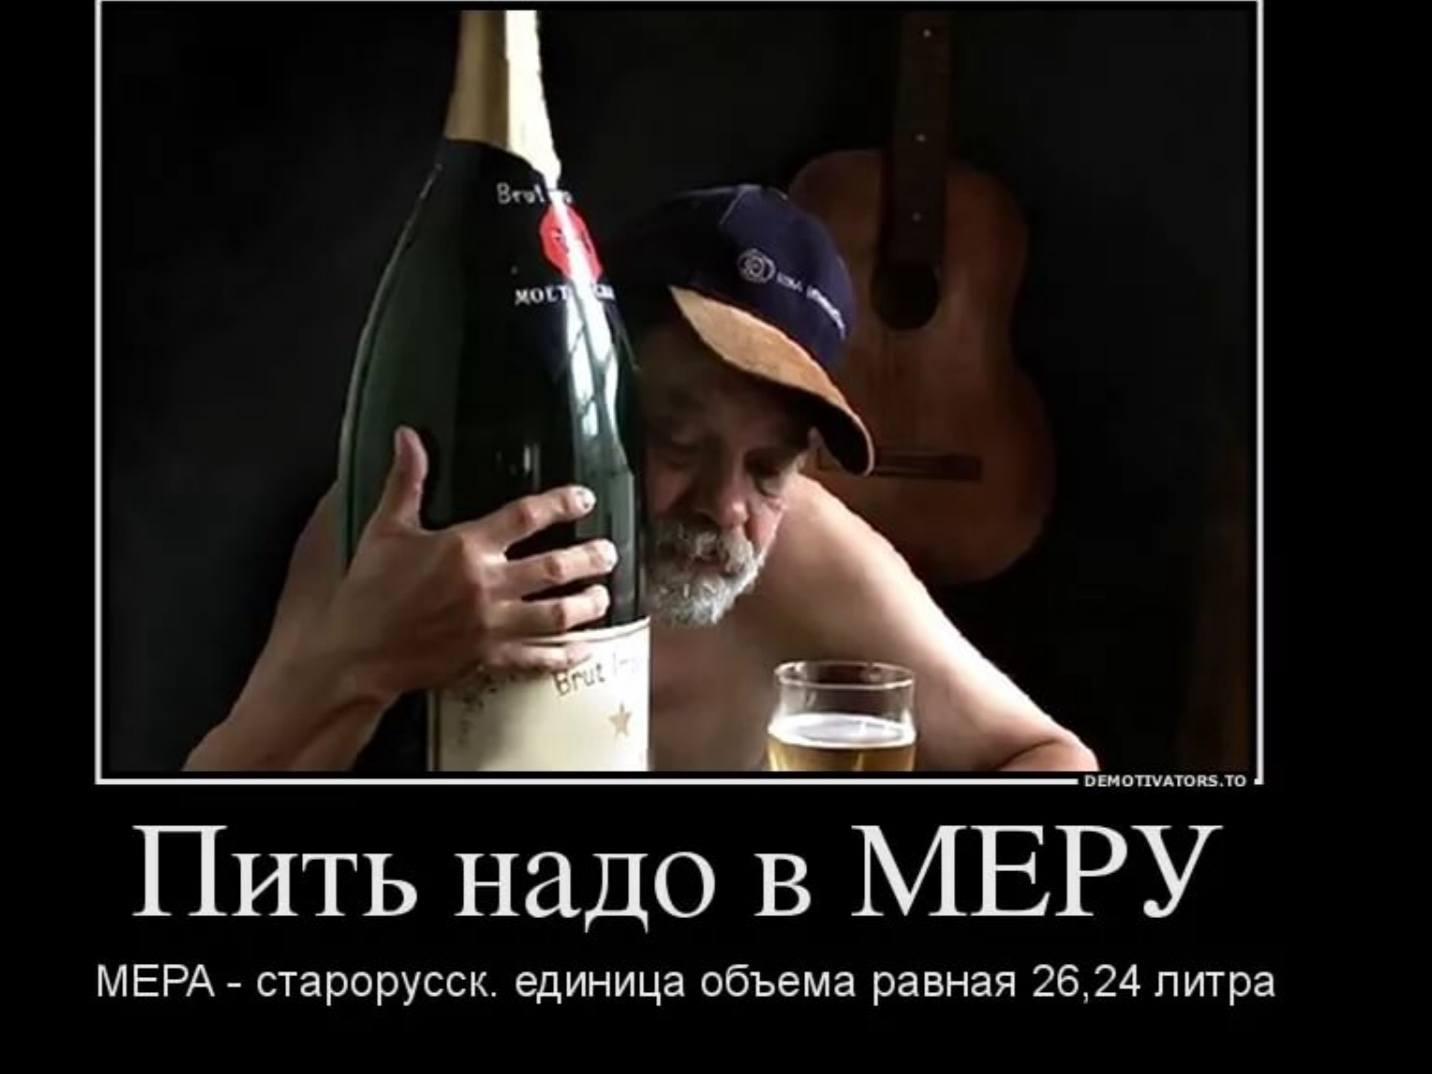 http://images.vfl.ru/ii/1541605881/a36860cb/24101564.jpg